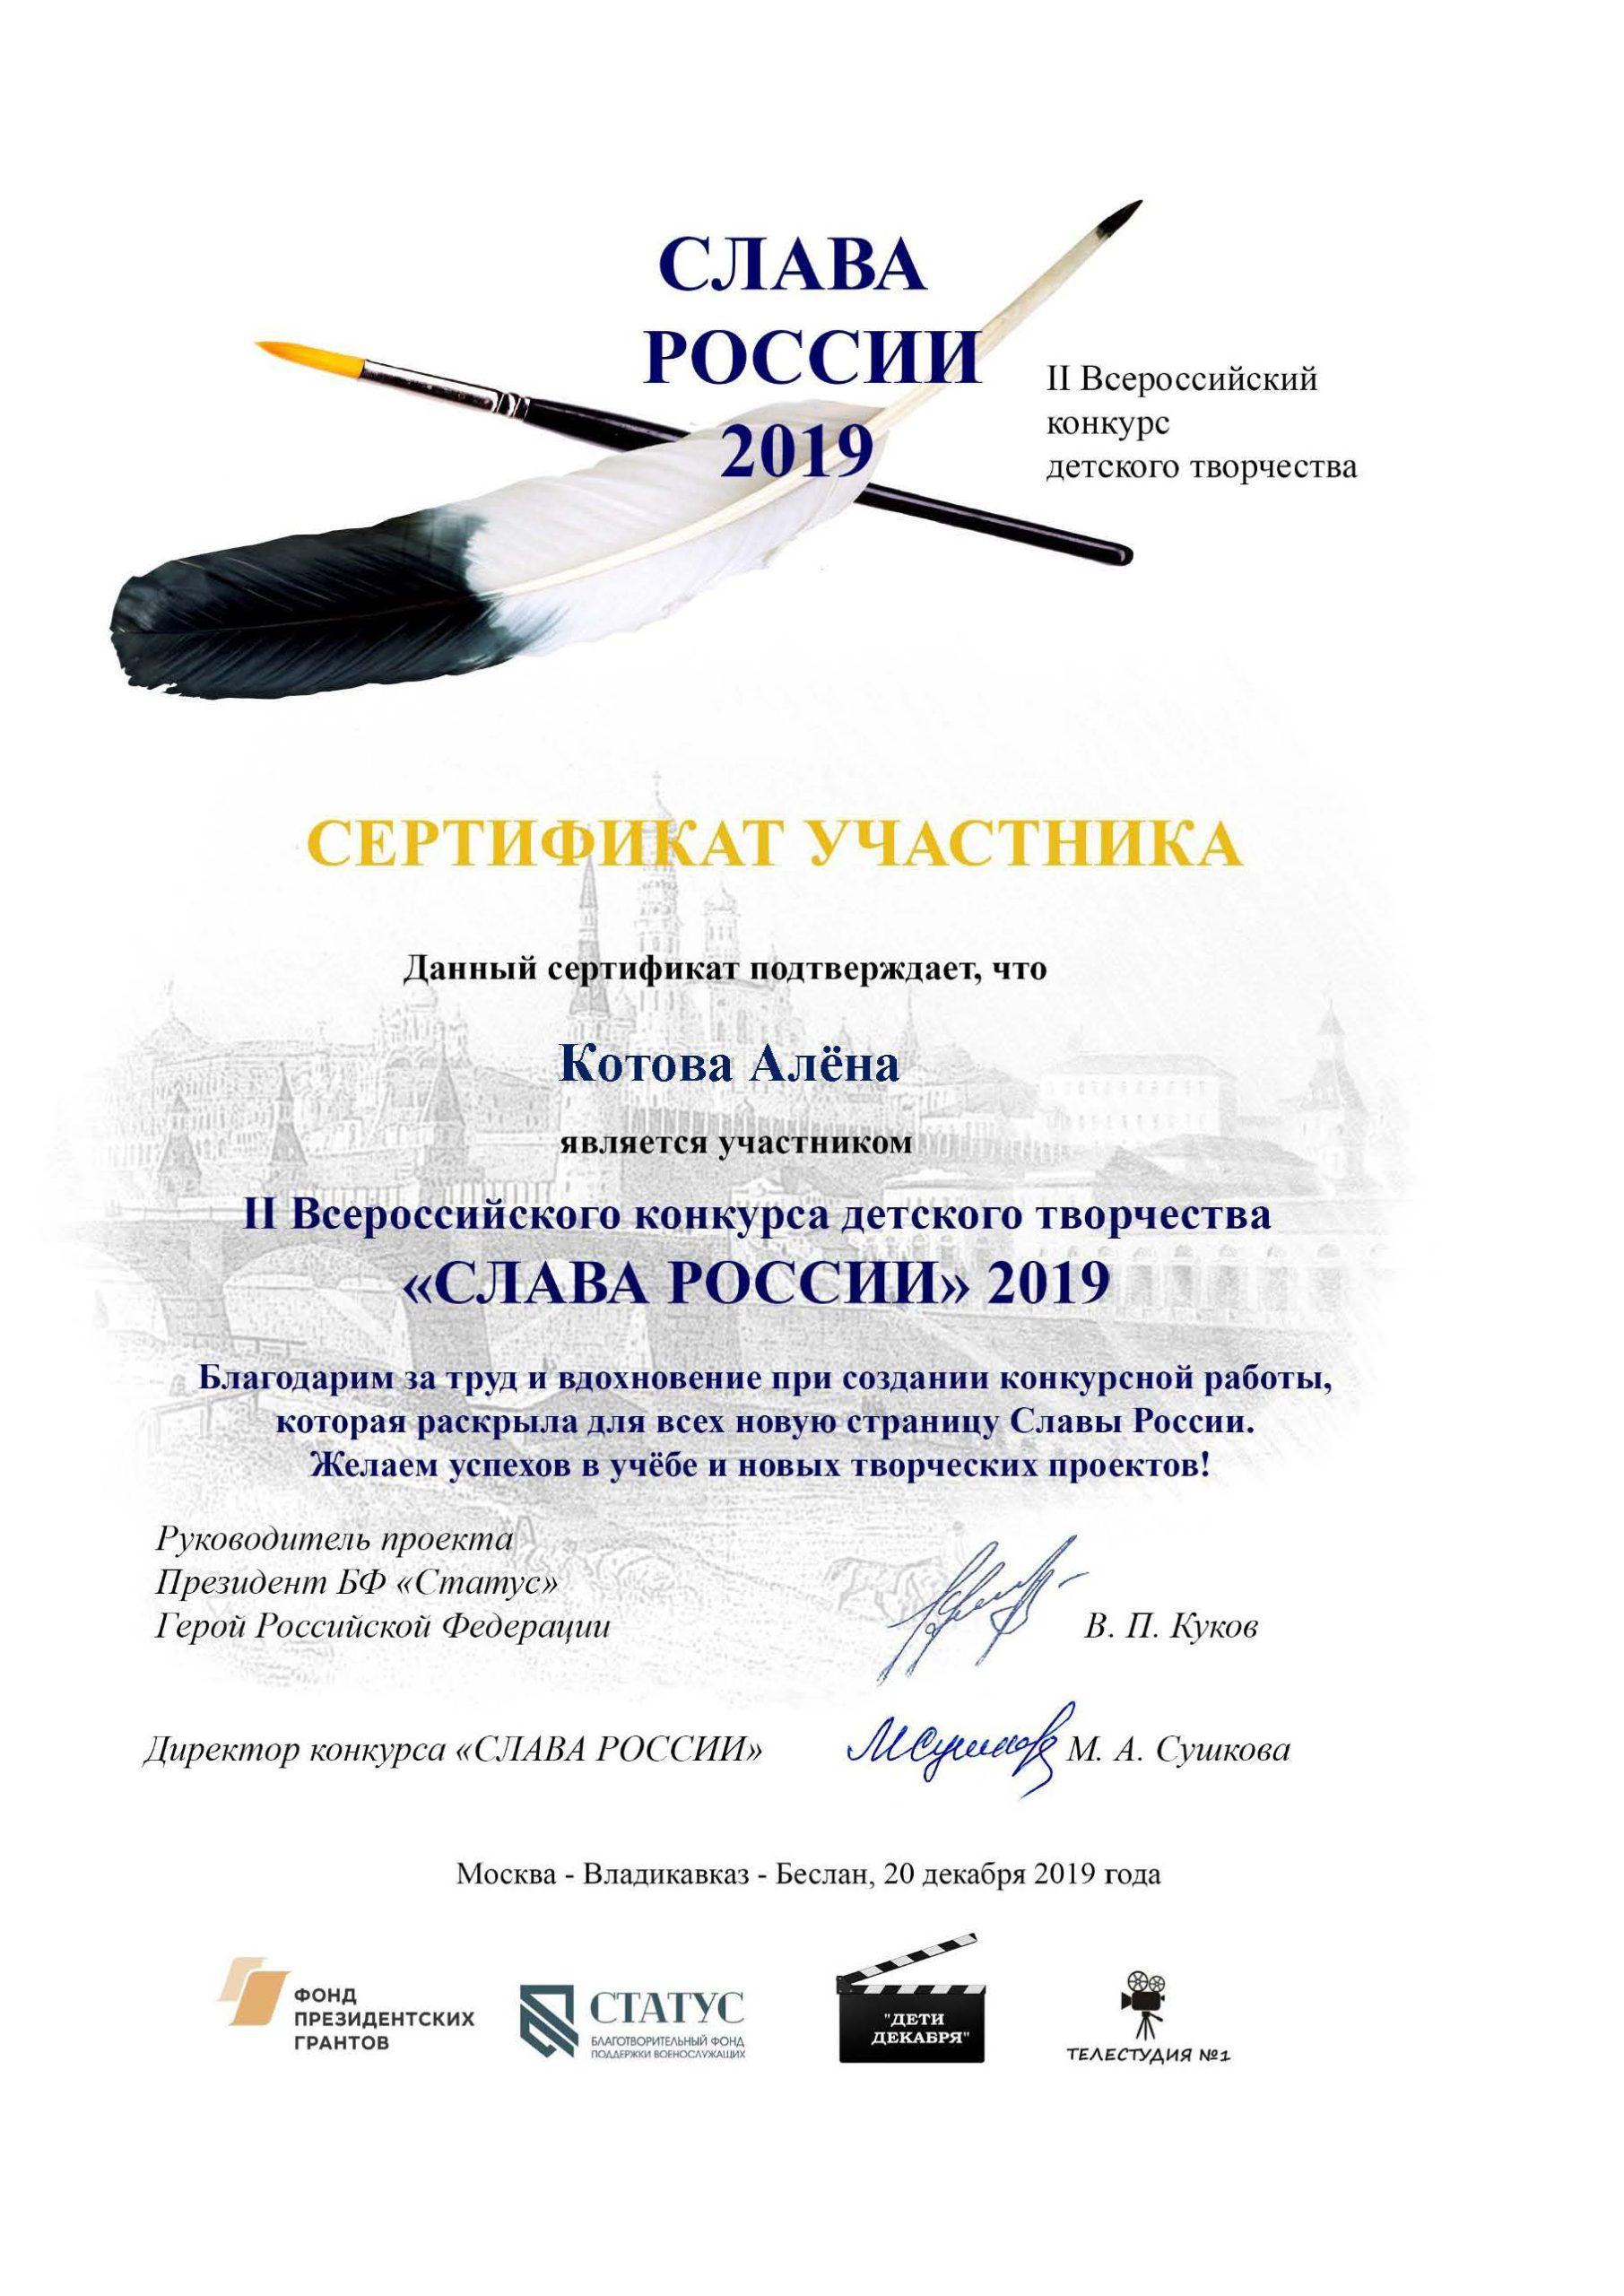 Котова Алёна